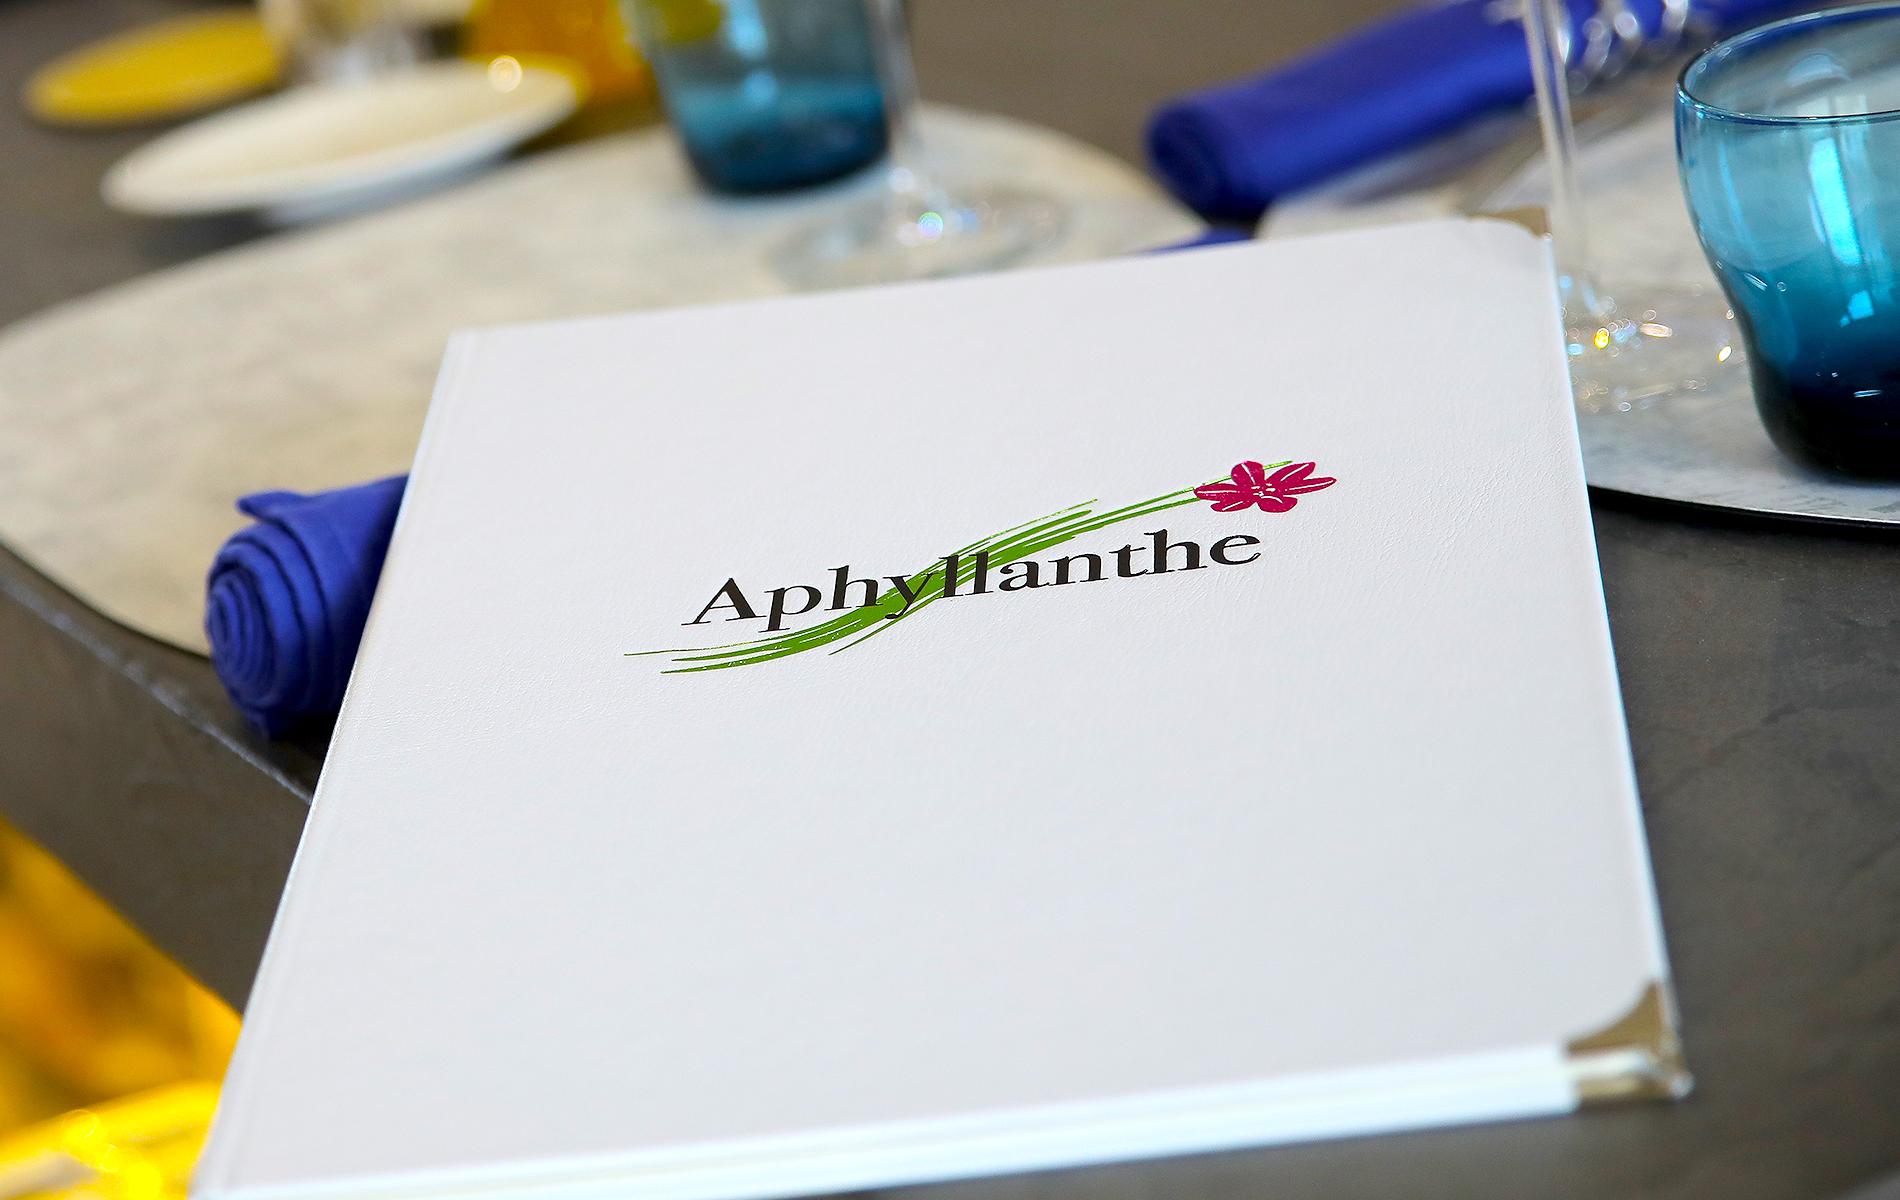 Aphyllanthe